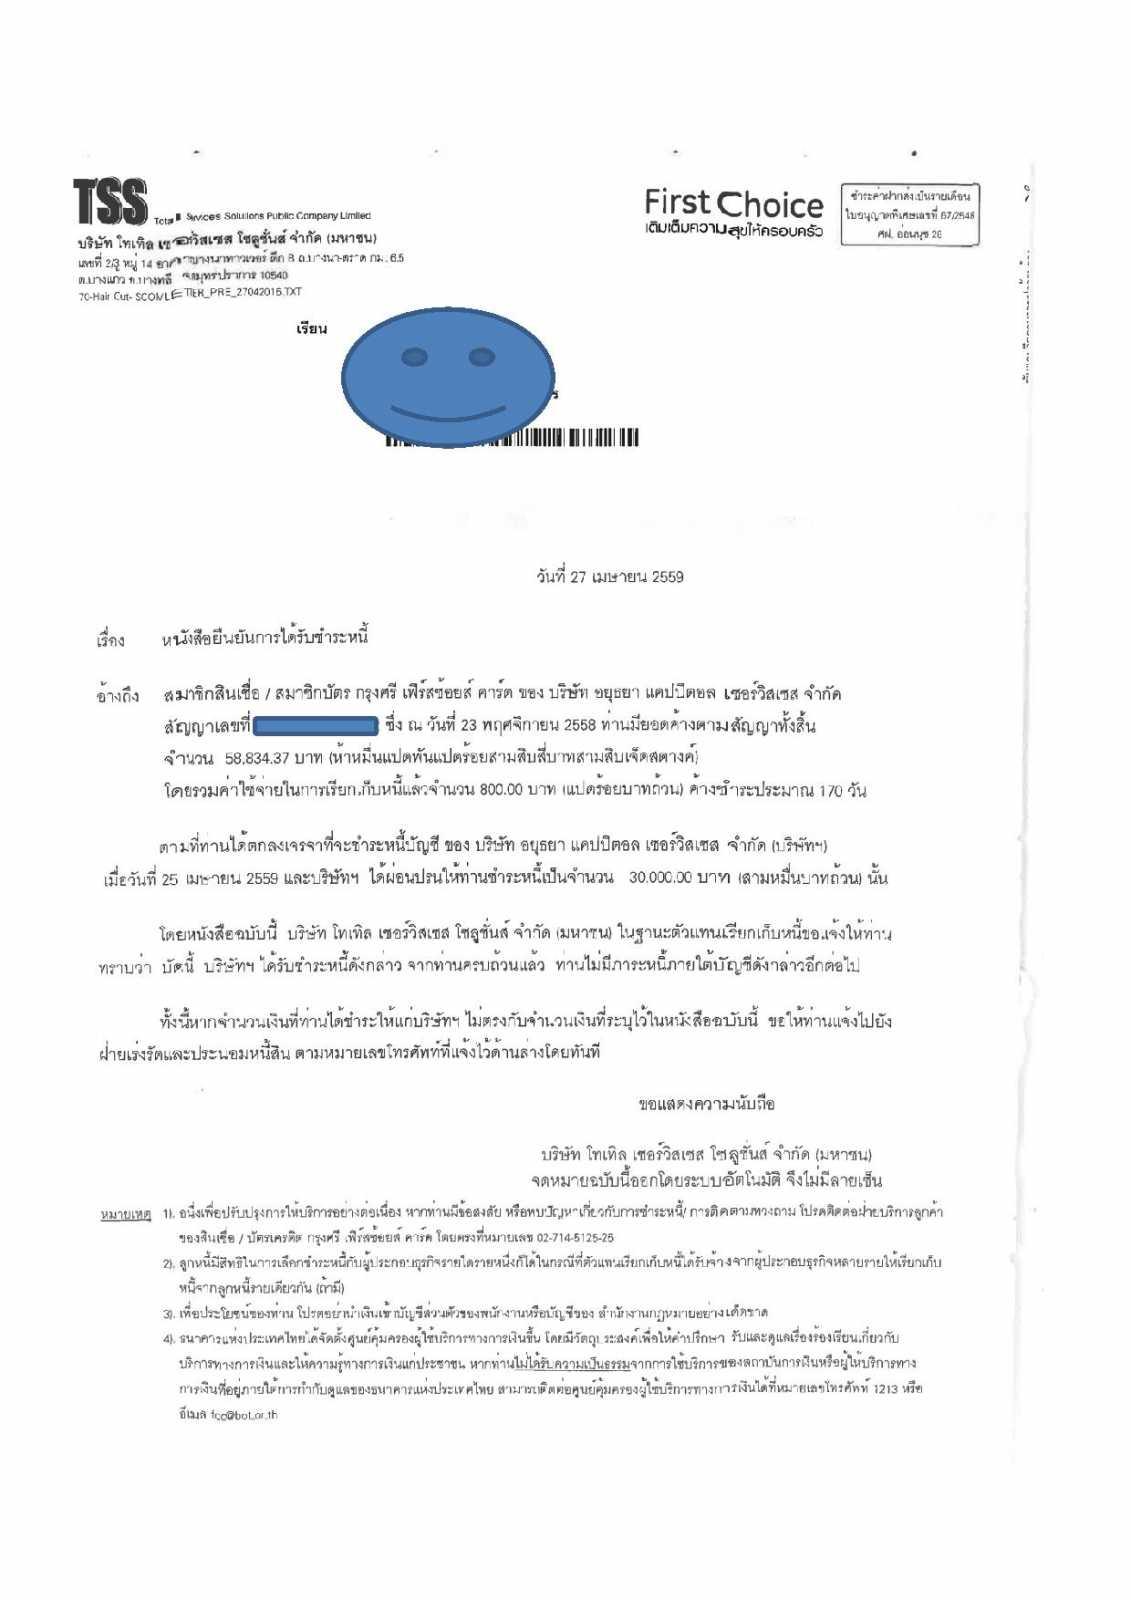 1-page-001_2016-05-12.jpg